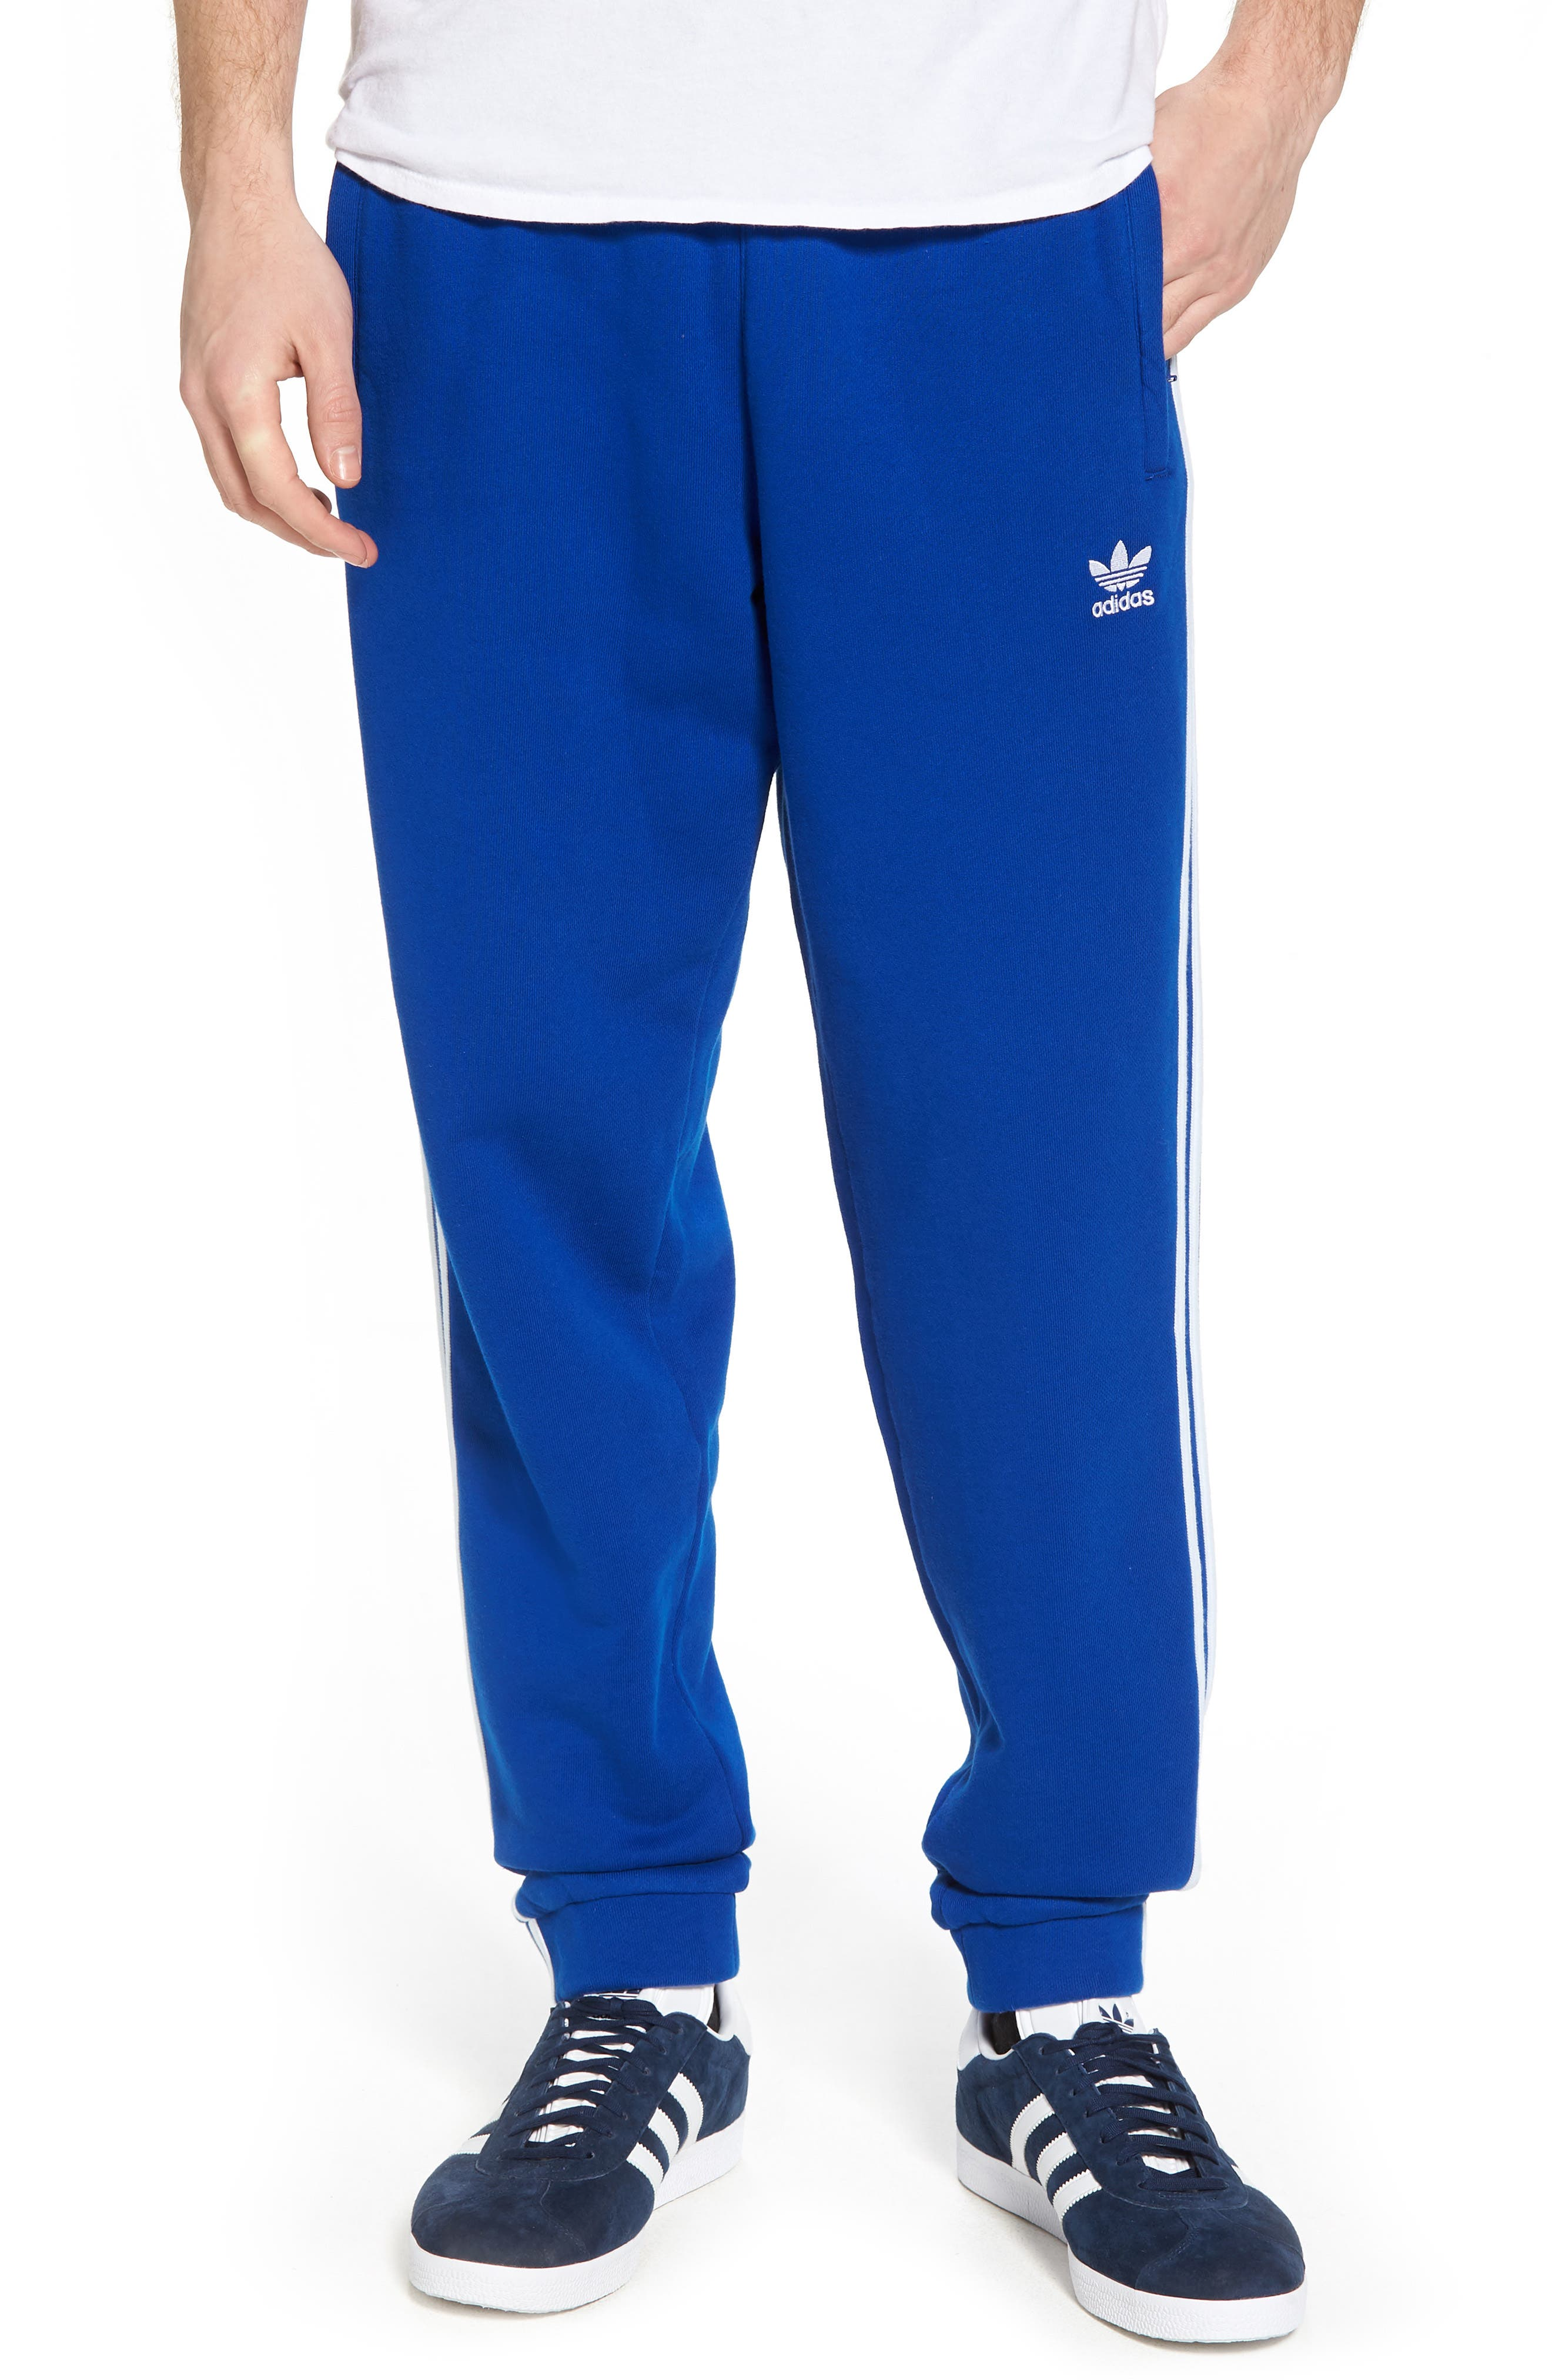 3-Stripes Sweatpants,                             Main thumbnail 1, color,                             Collegiate Royal